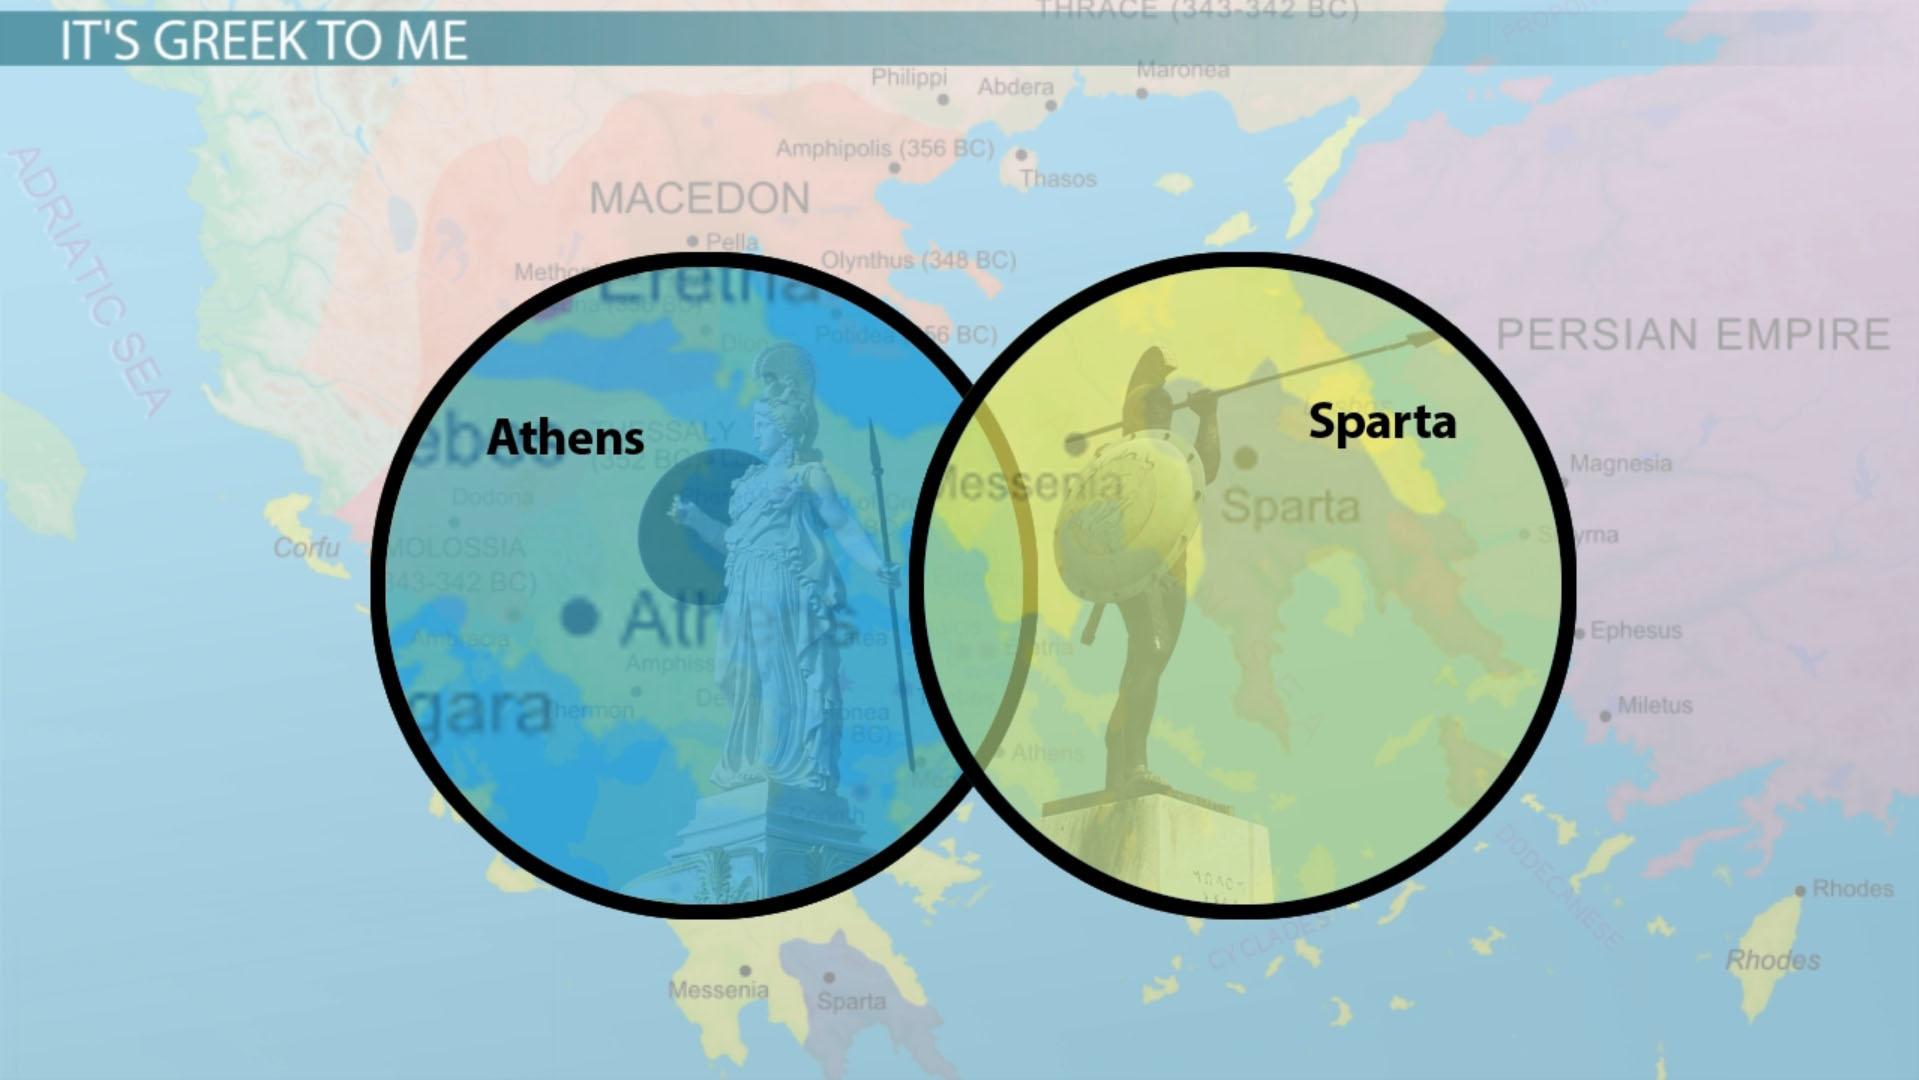 Life In Athens Vs Life In Sparta